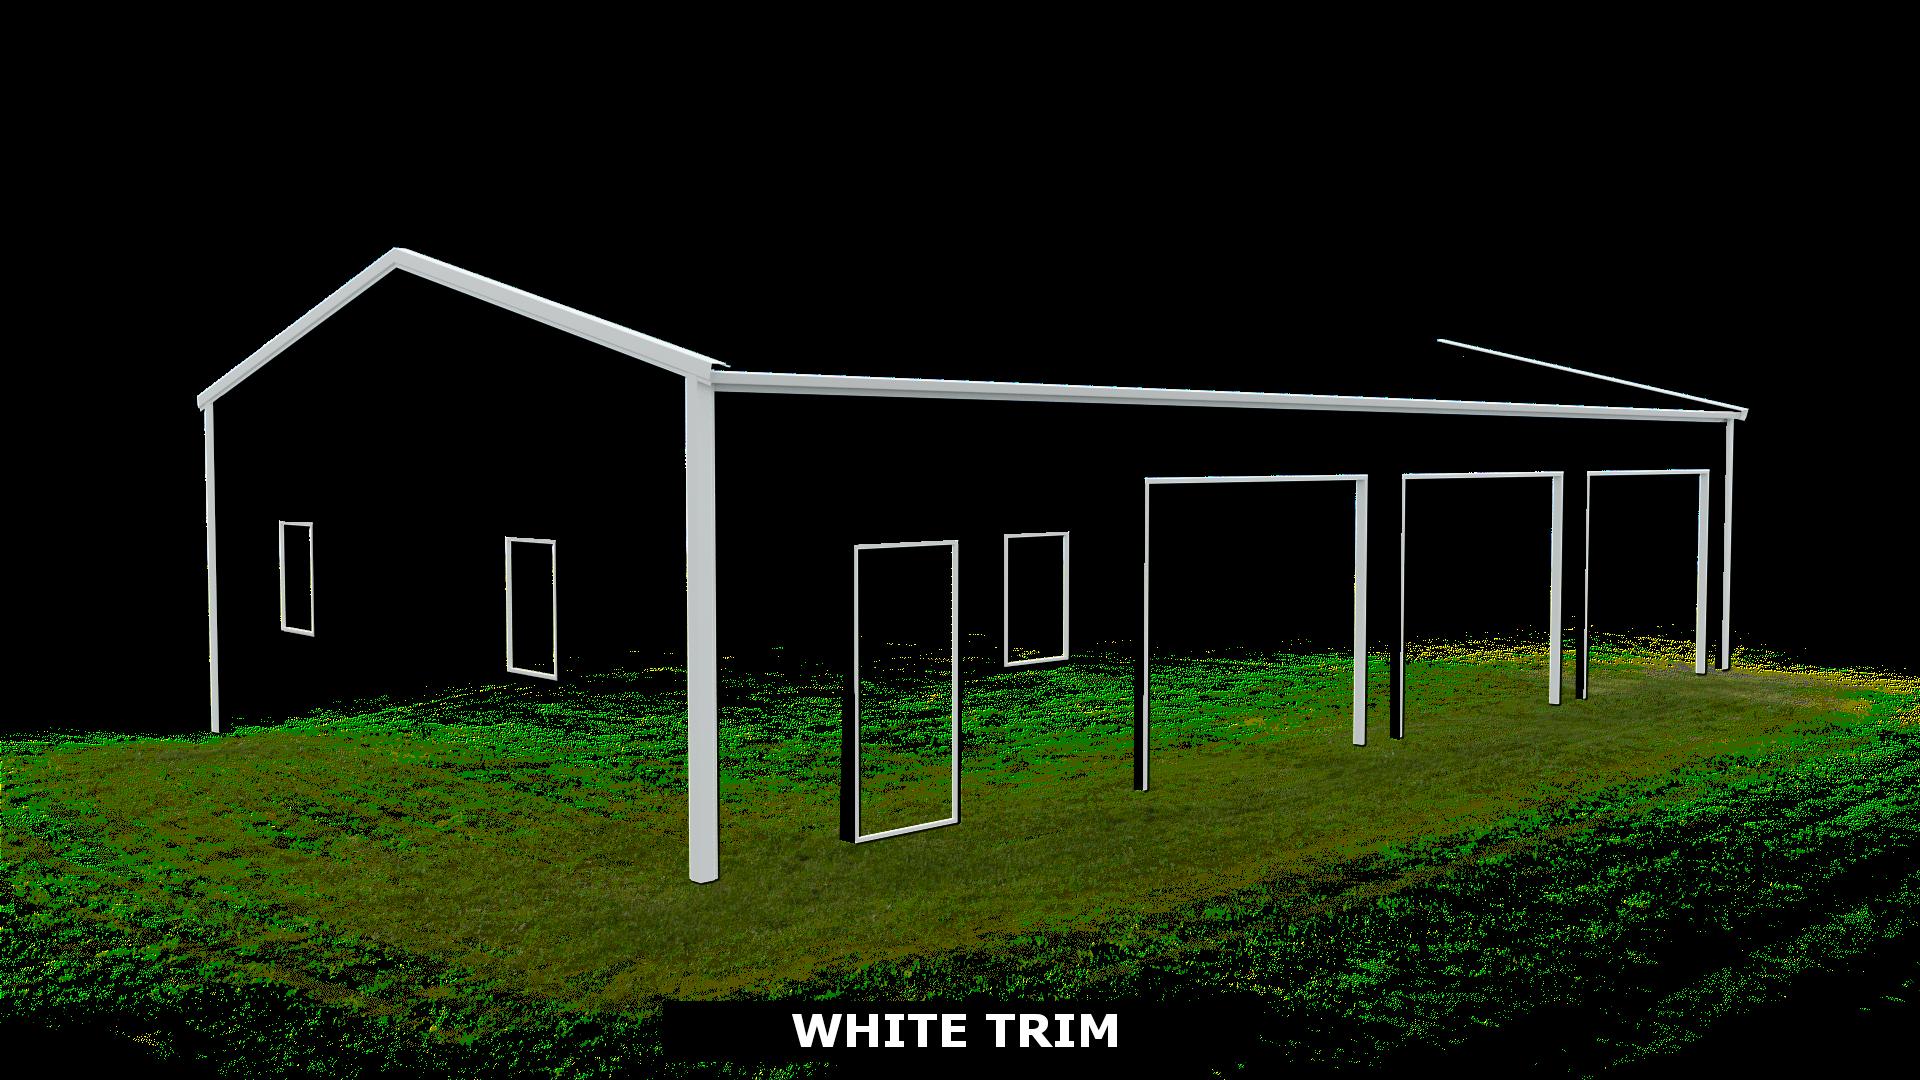 WHITE TRIM